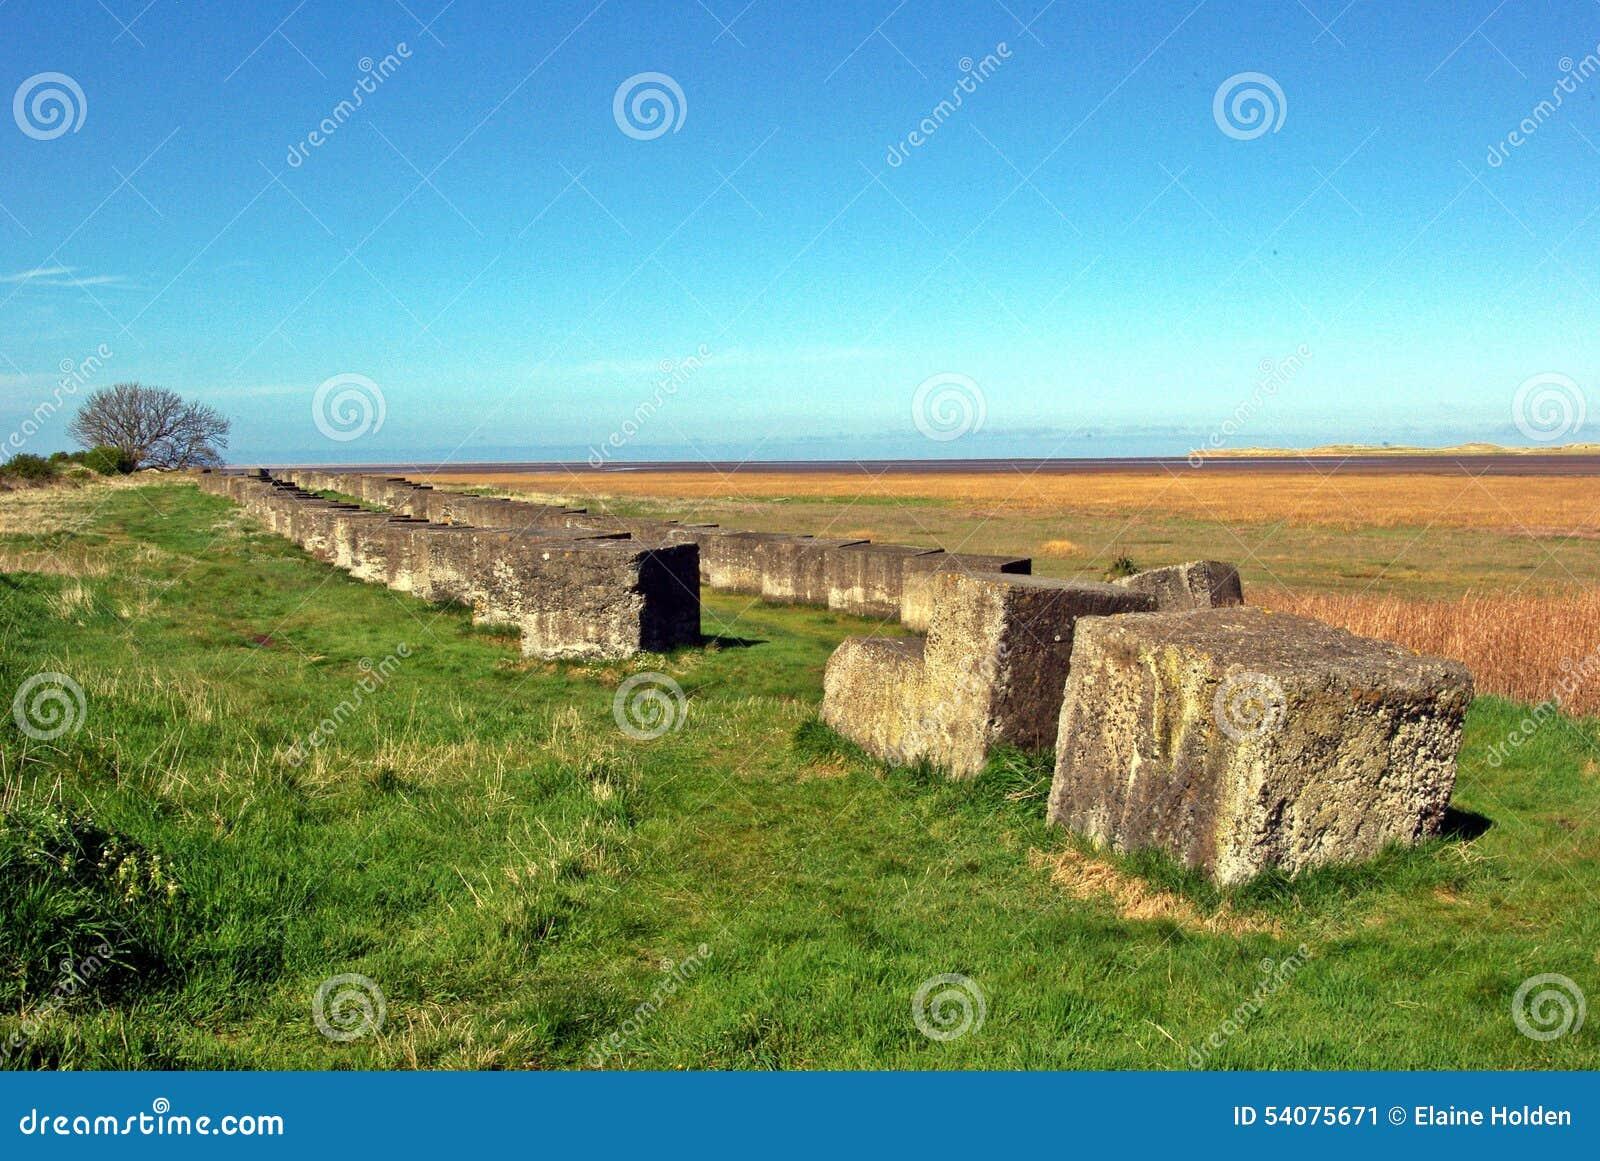 Antitank concrete blokken